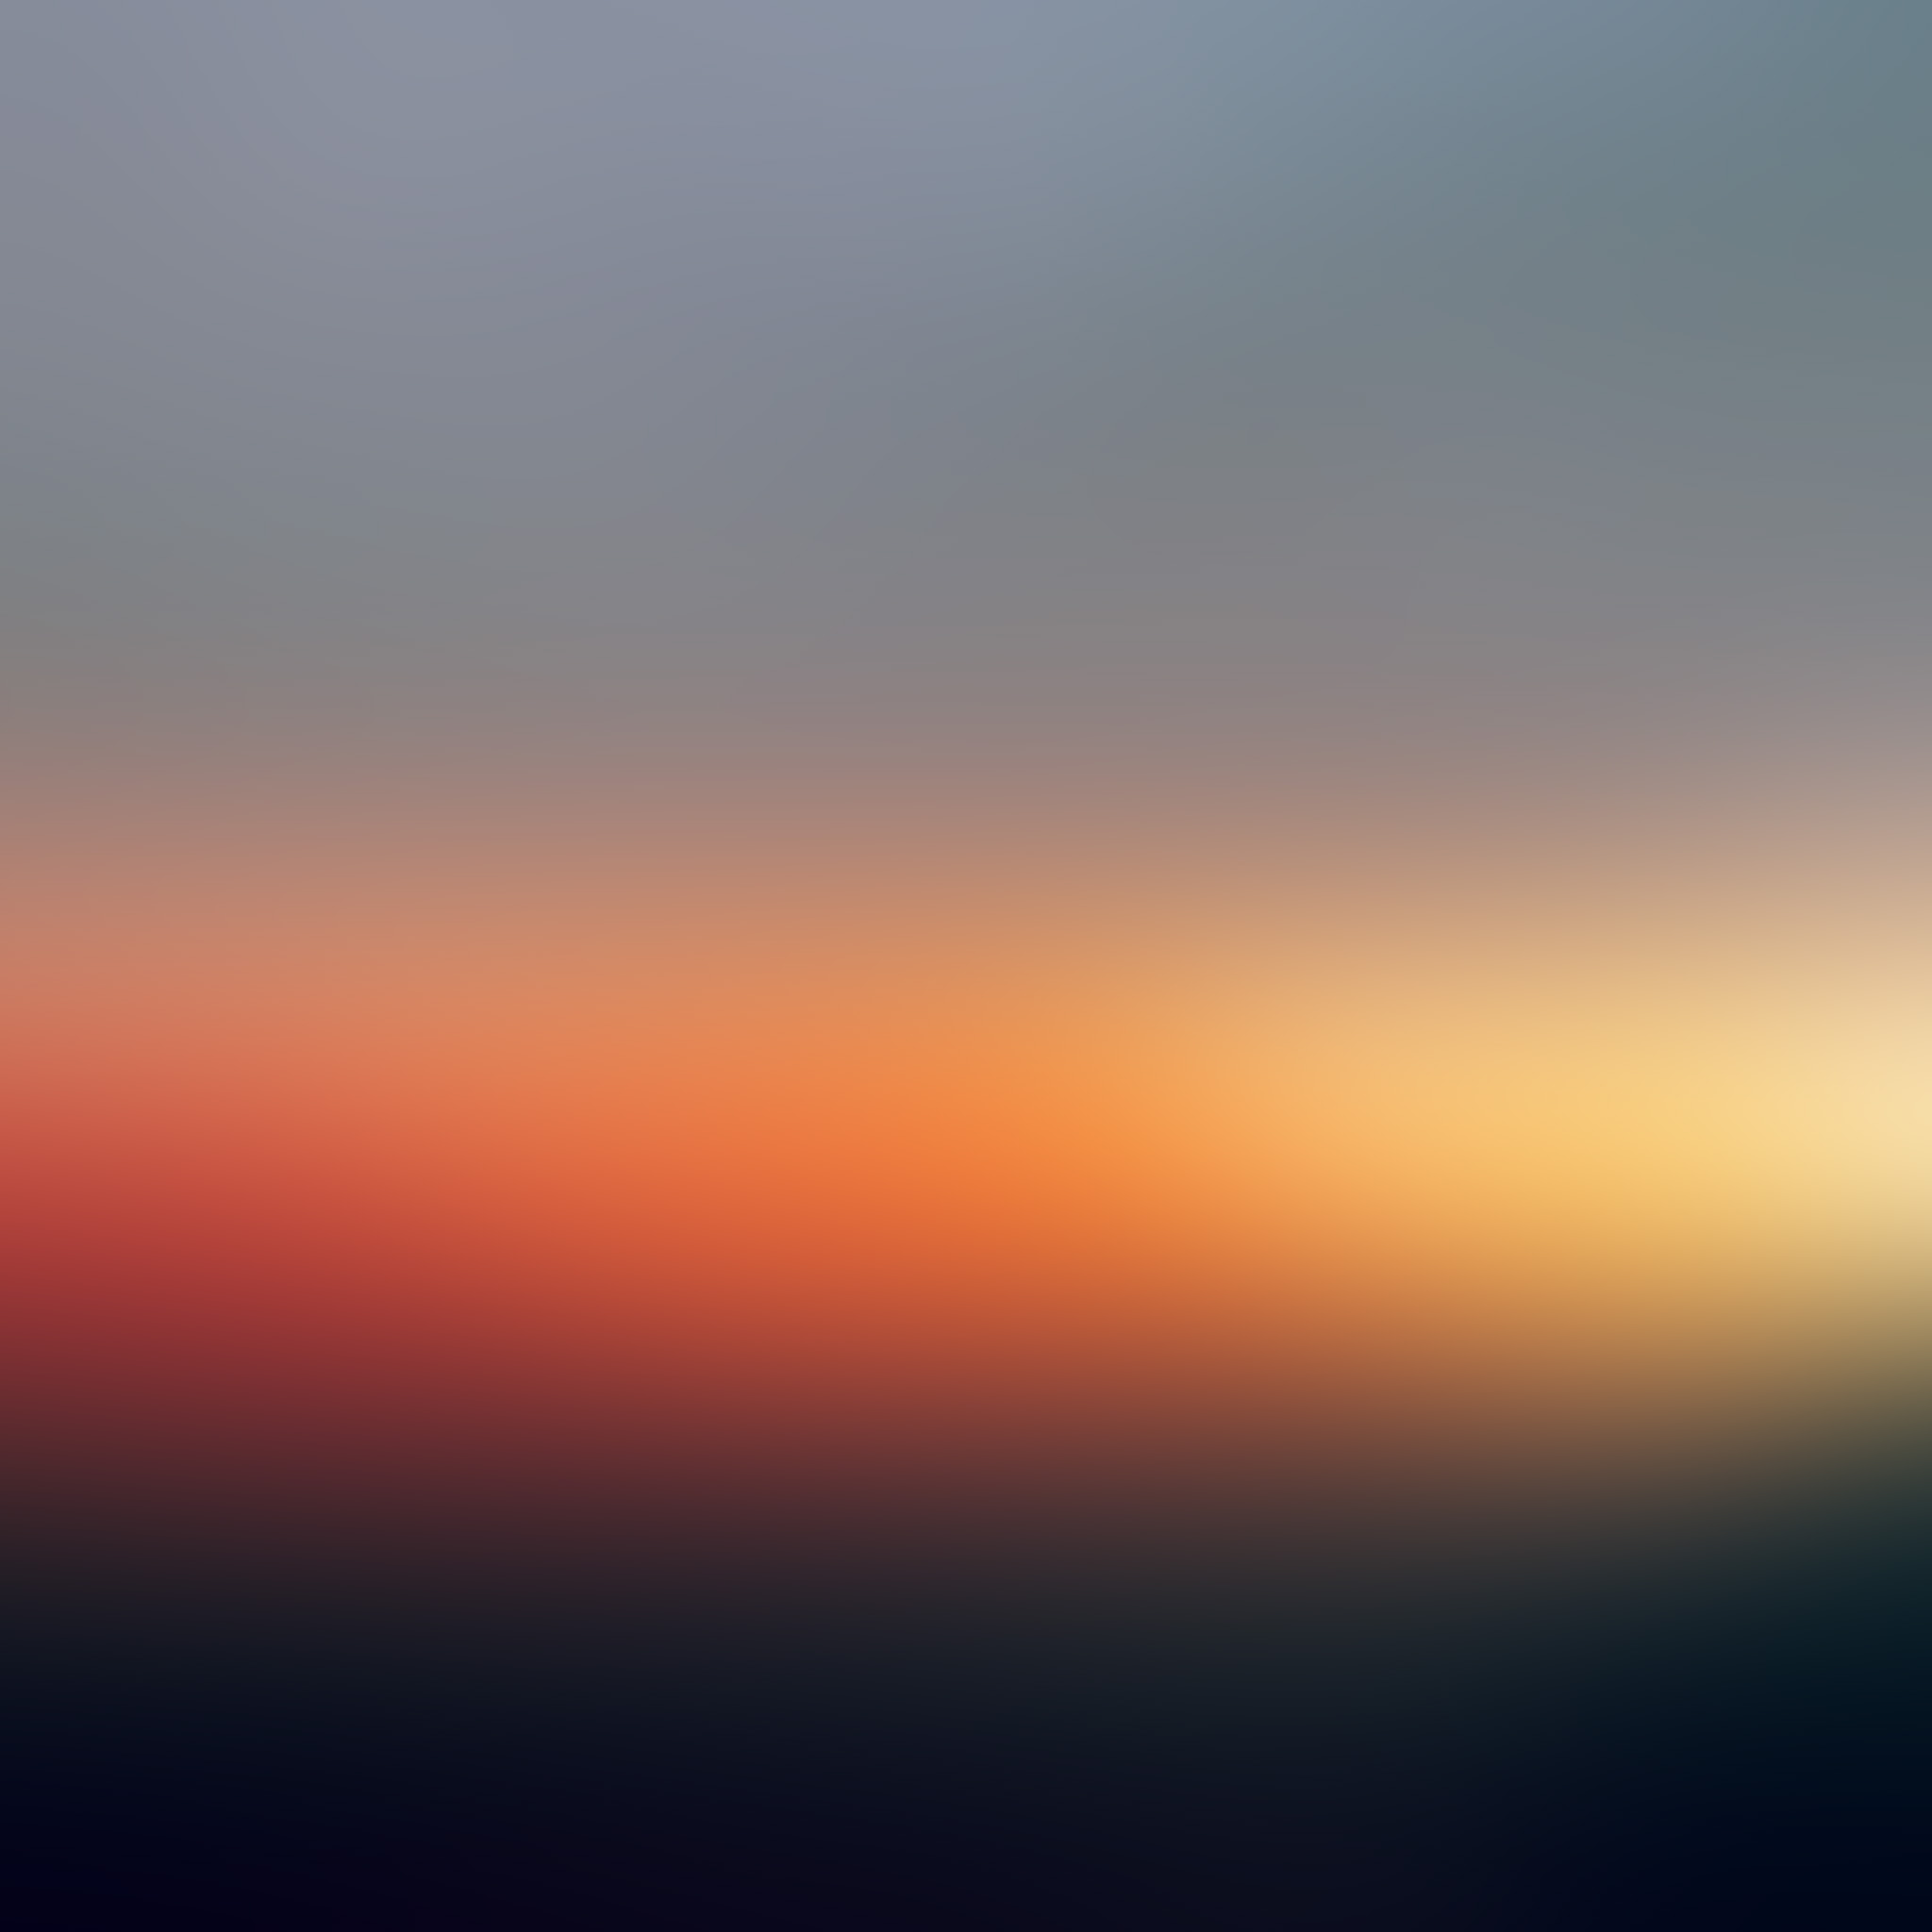 sunset wallpaper iphone 5